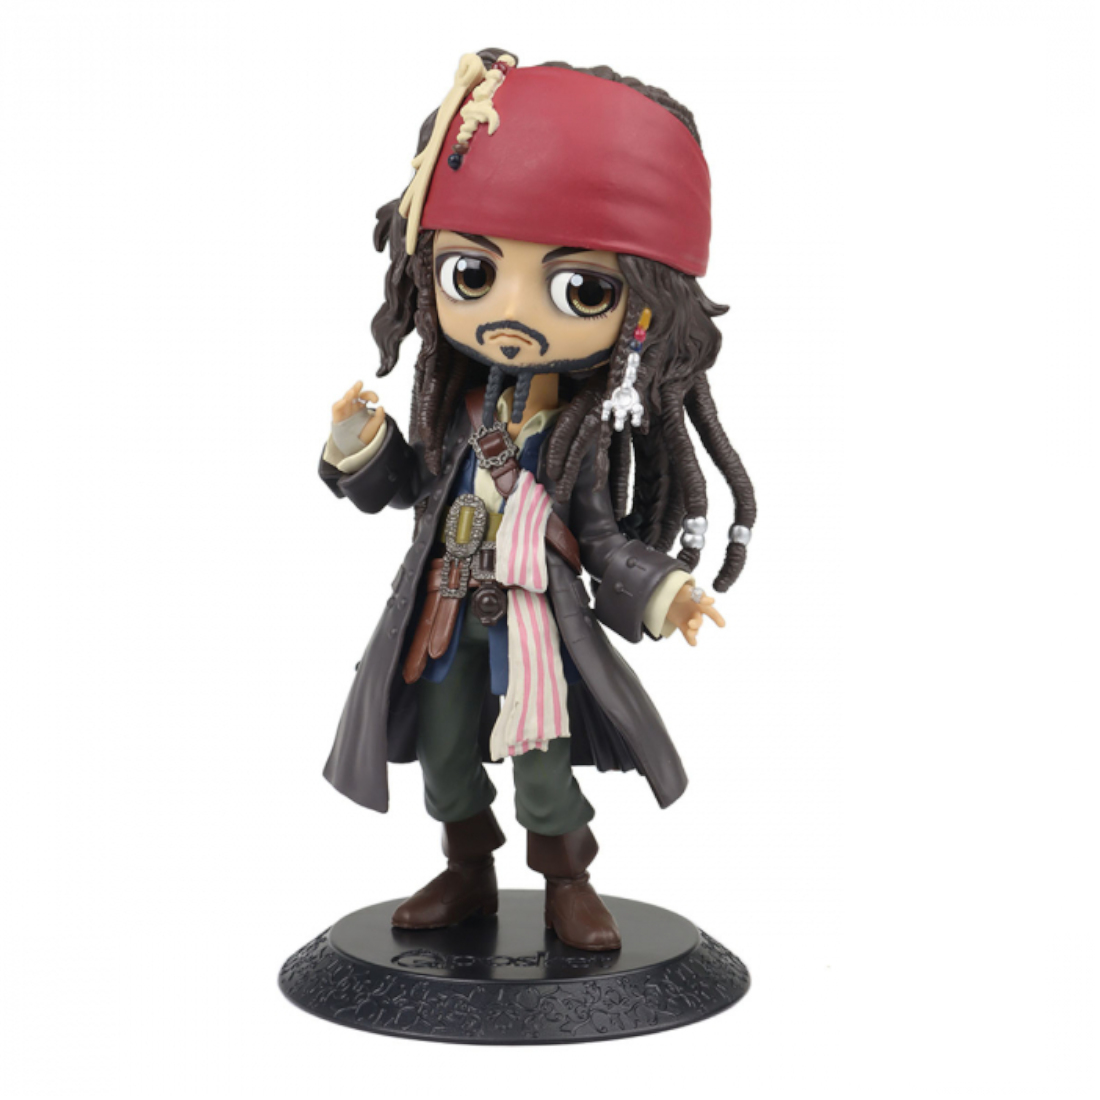 Banpresto Pirates of the Caribbean Qposket Jack Sparrow